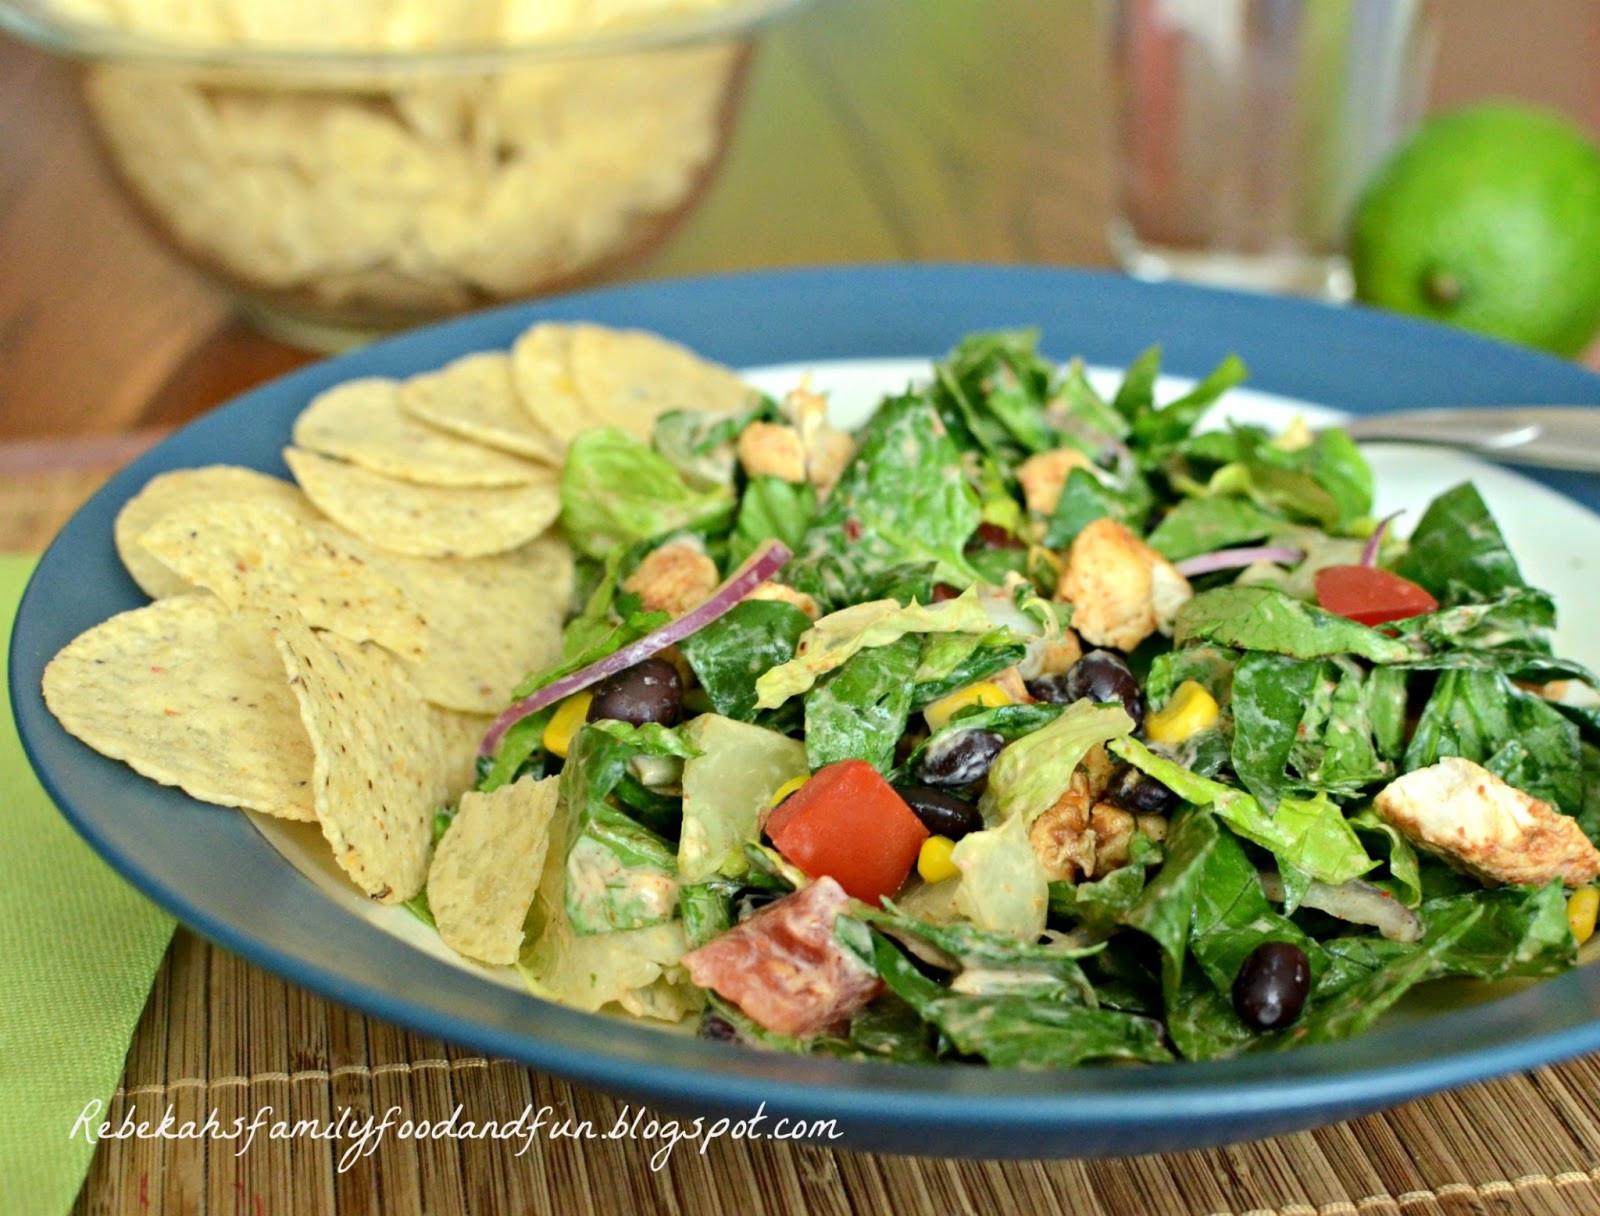 Chipotle Chicken Salad  Family Food and Fun Chipotle Chicken Taco Salad SRC